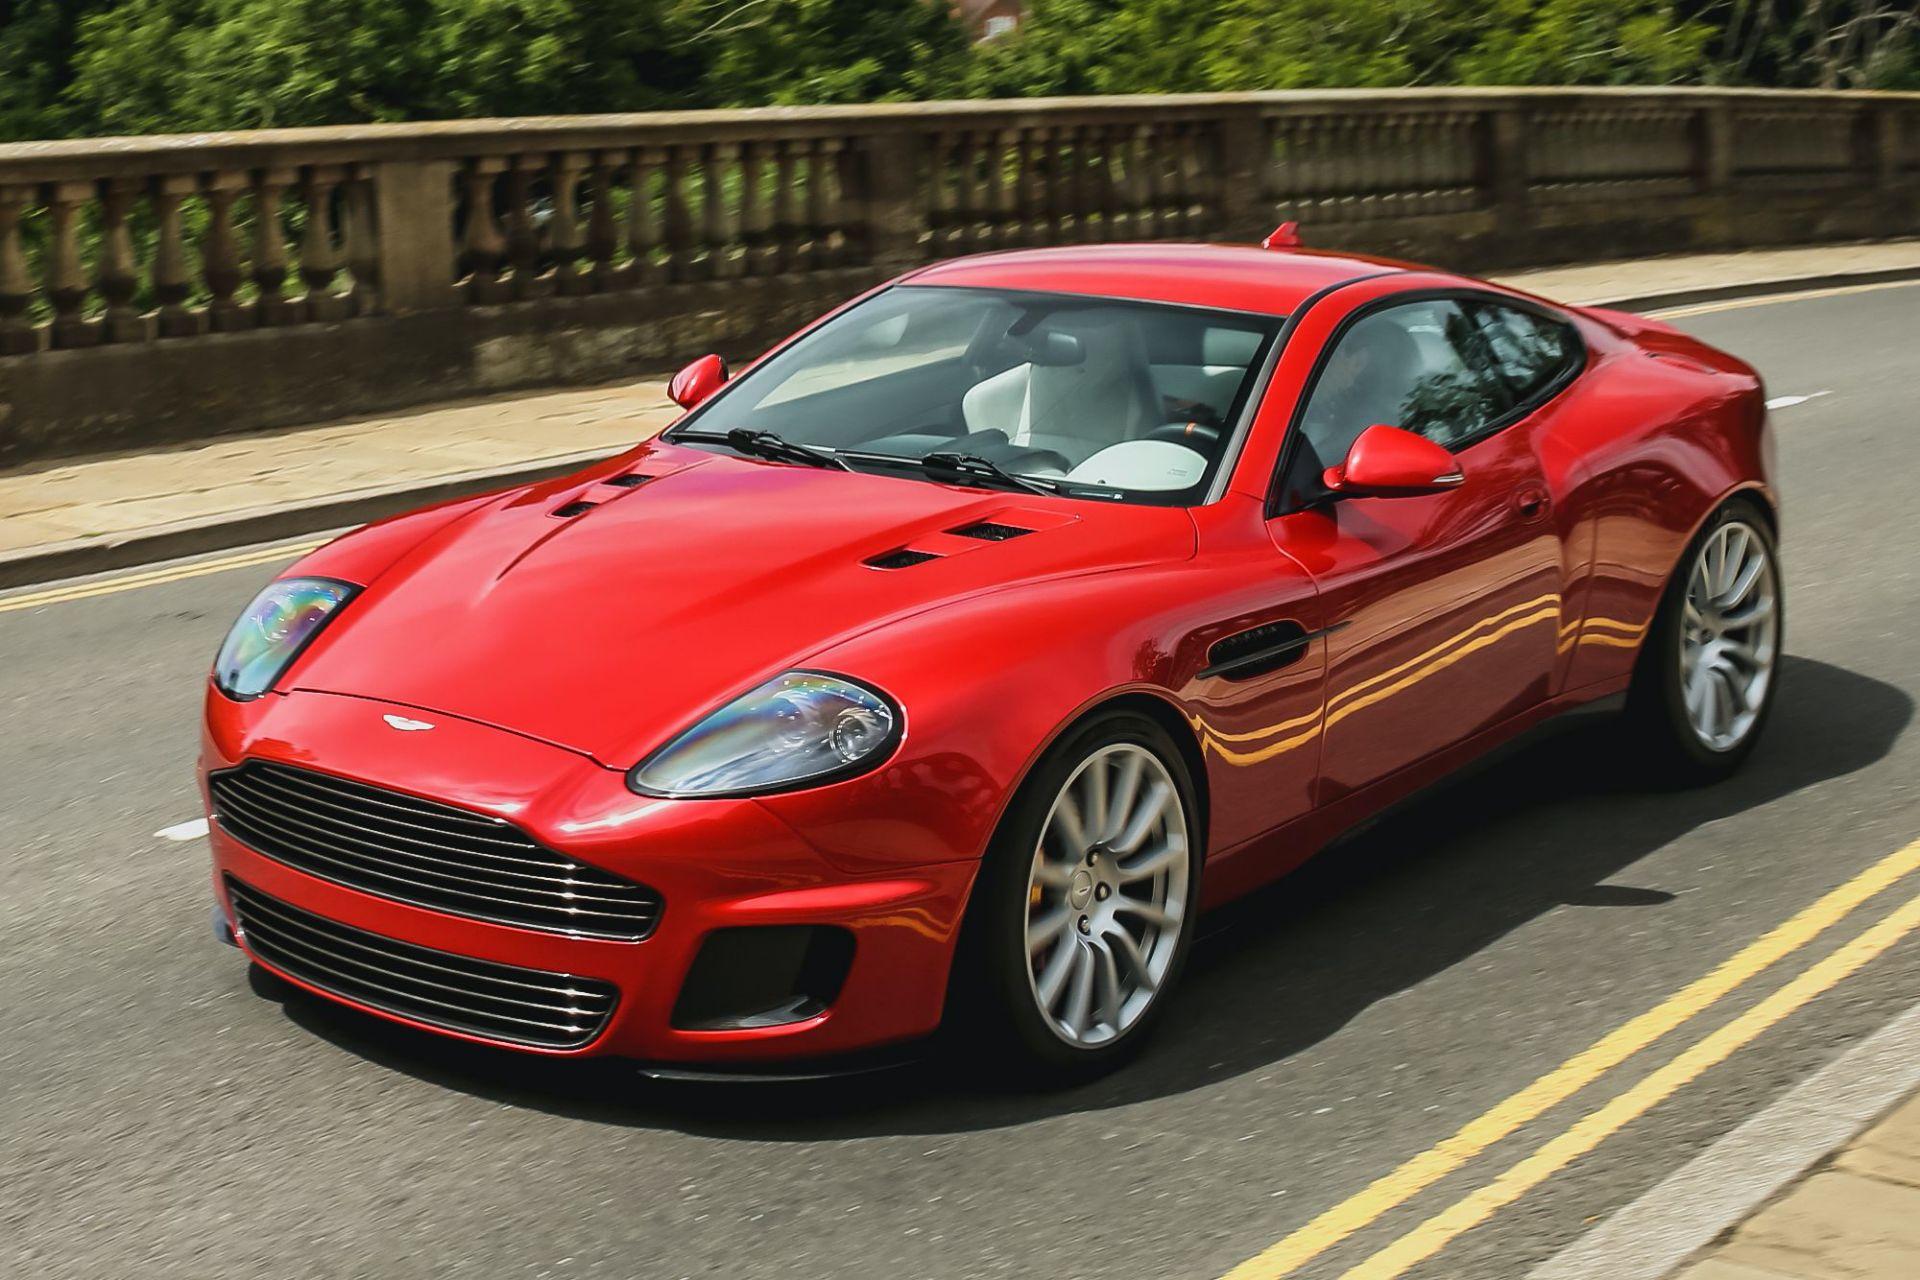 Aston-Martin-Callum-Vanquish-25-By-R-Reforged-5